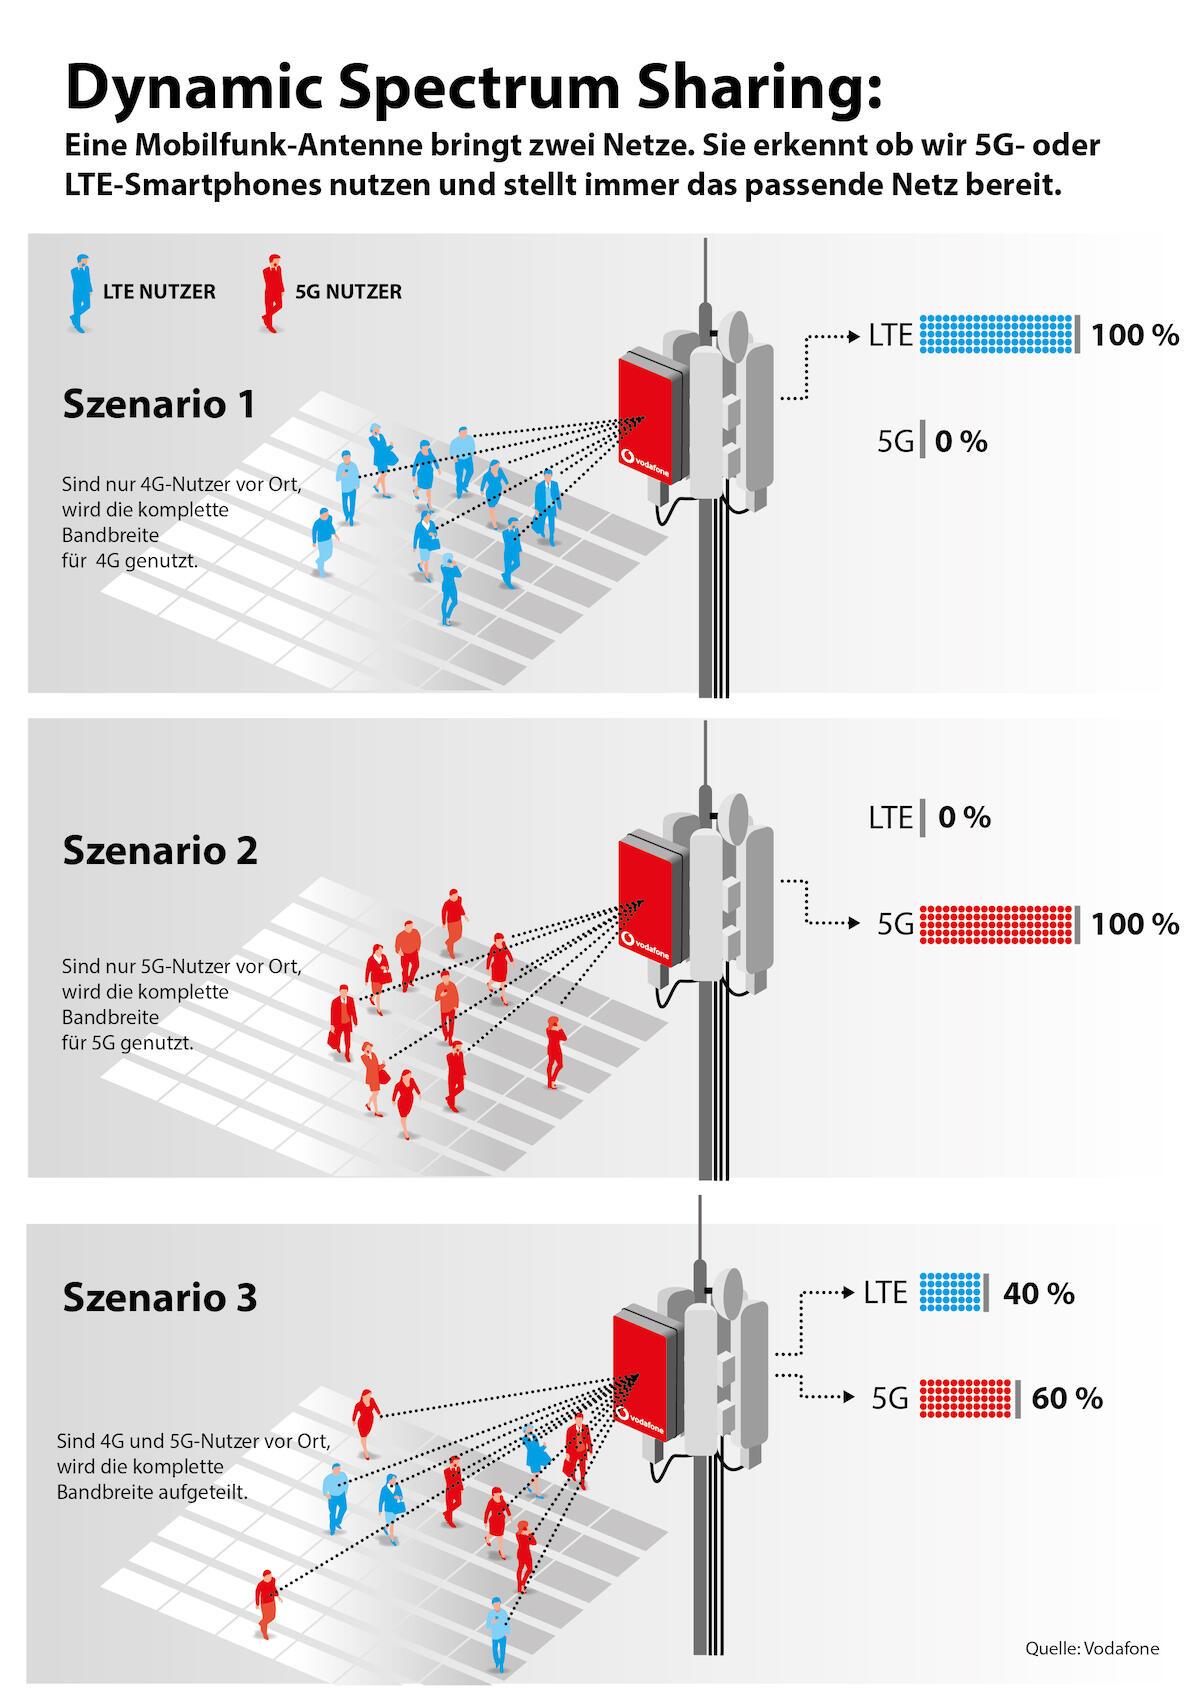 Vodafone DSS Infografik. Bild: Vodafone.